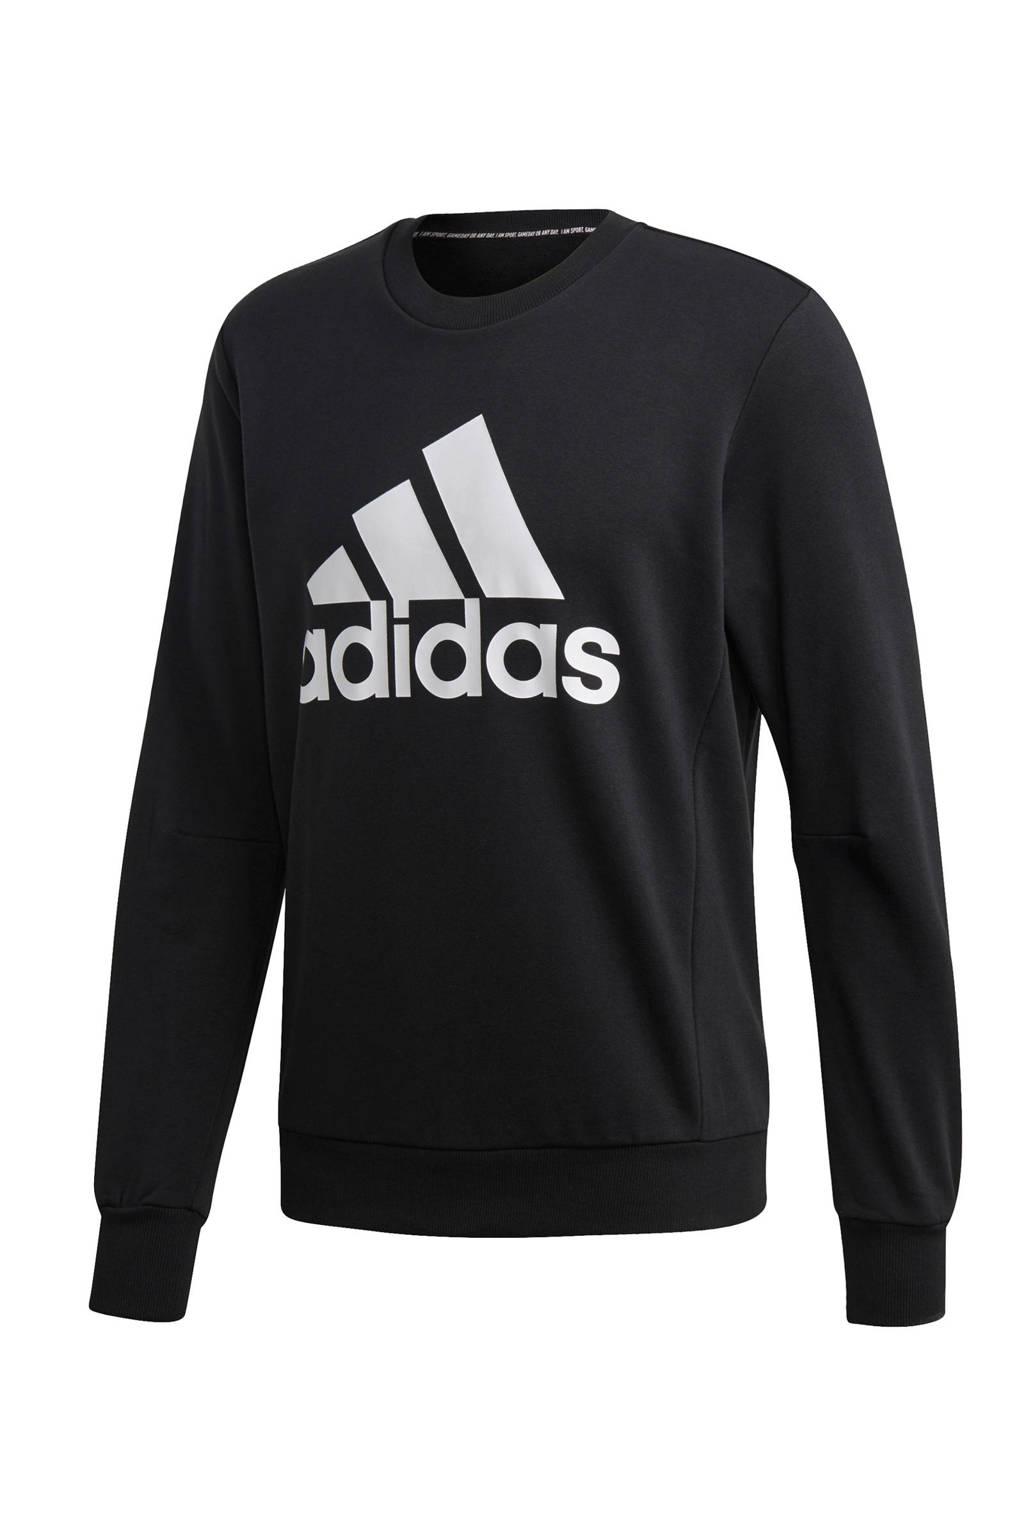 adidas   sportsweater zwart, Zwart